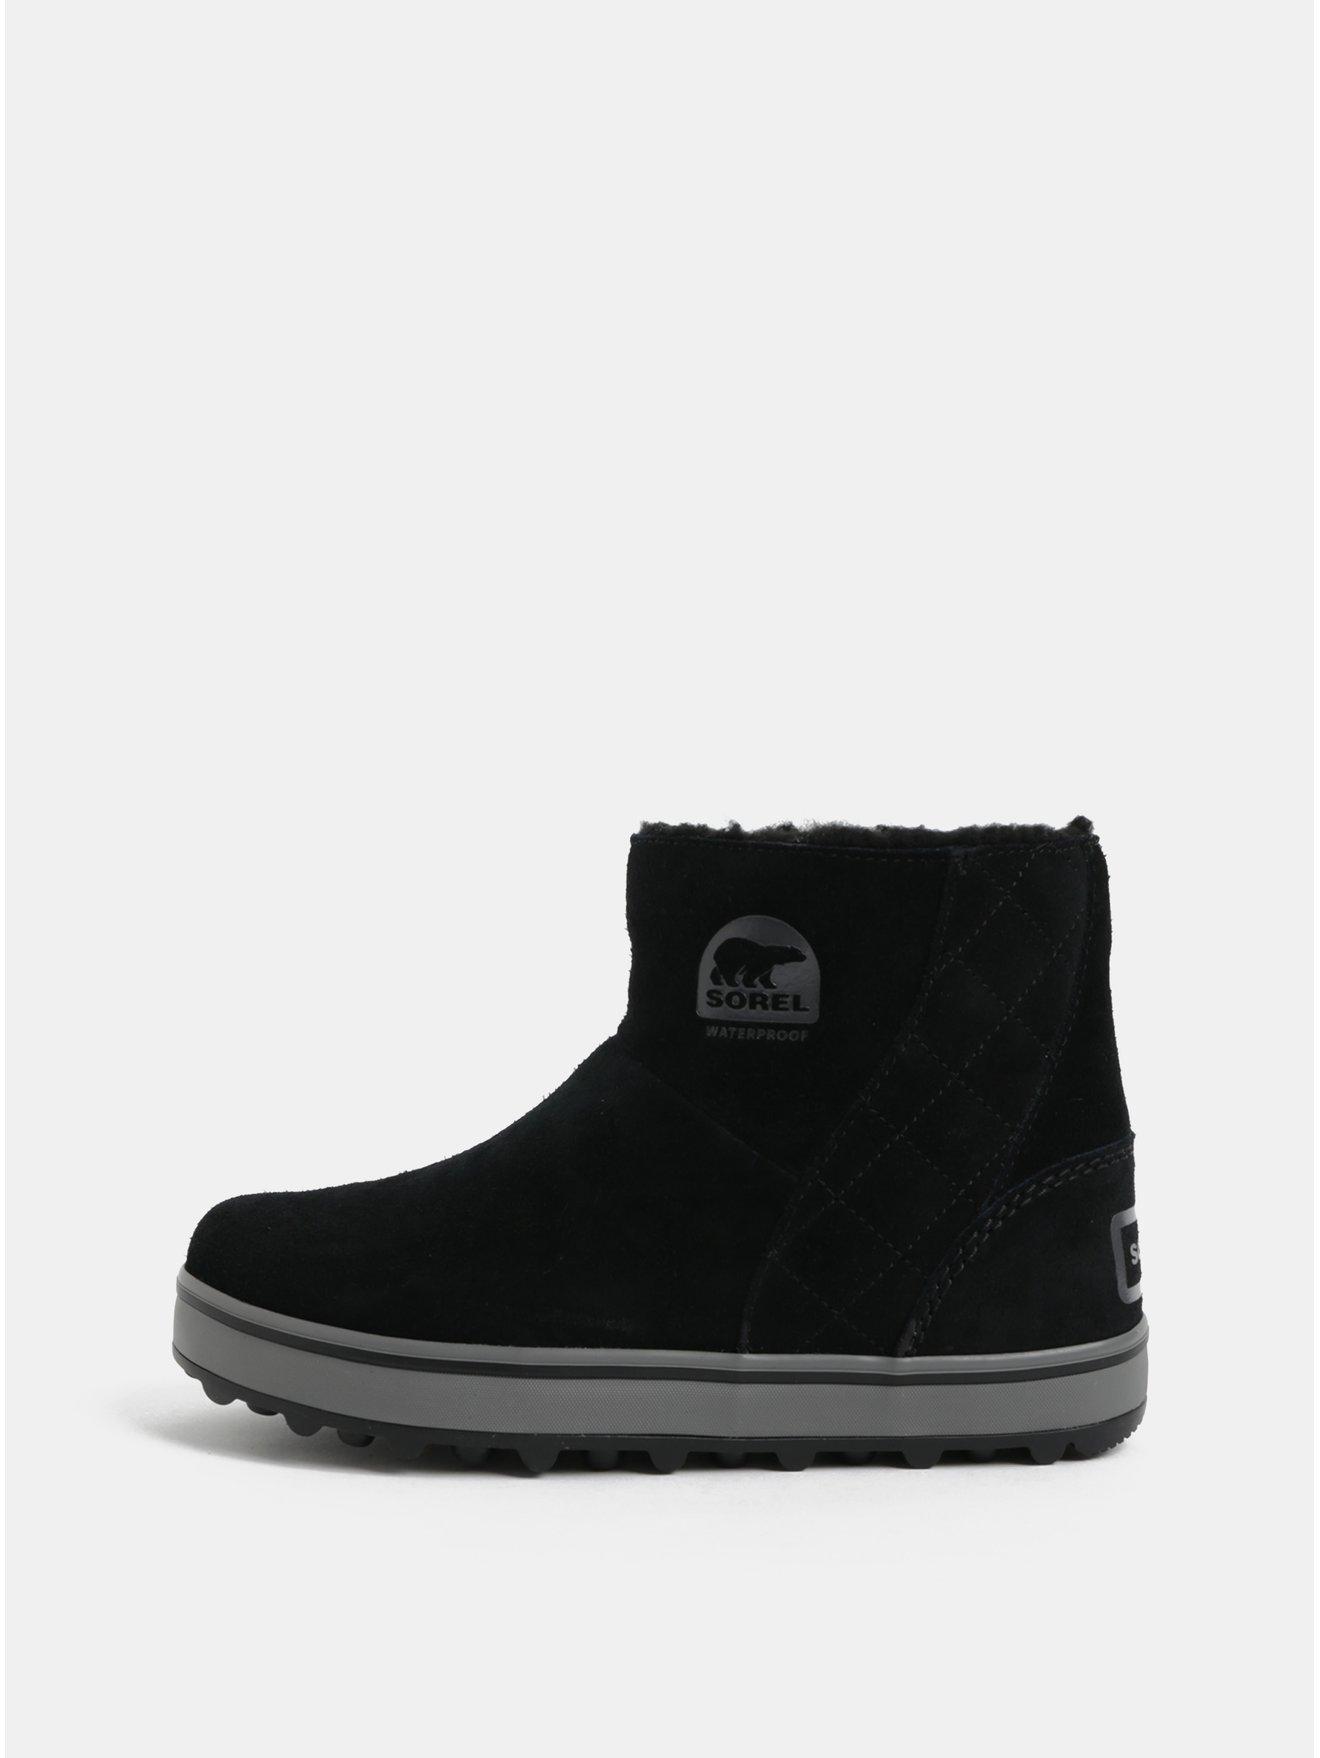 9c148a135e8a7 Čierne dámske semišové zimné nepremokavé topánky SOREL Glacy Short